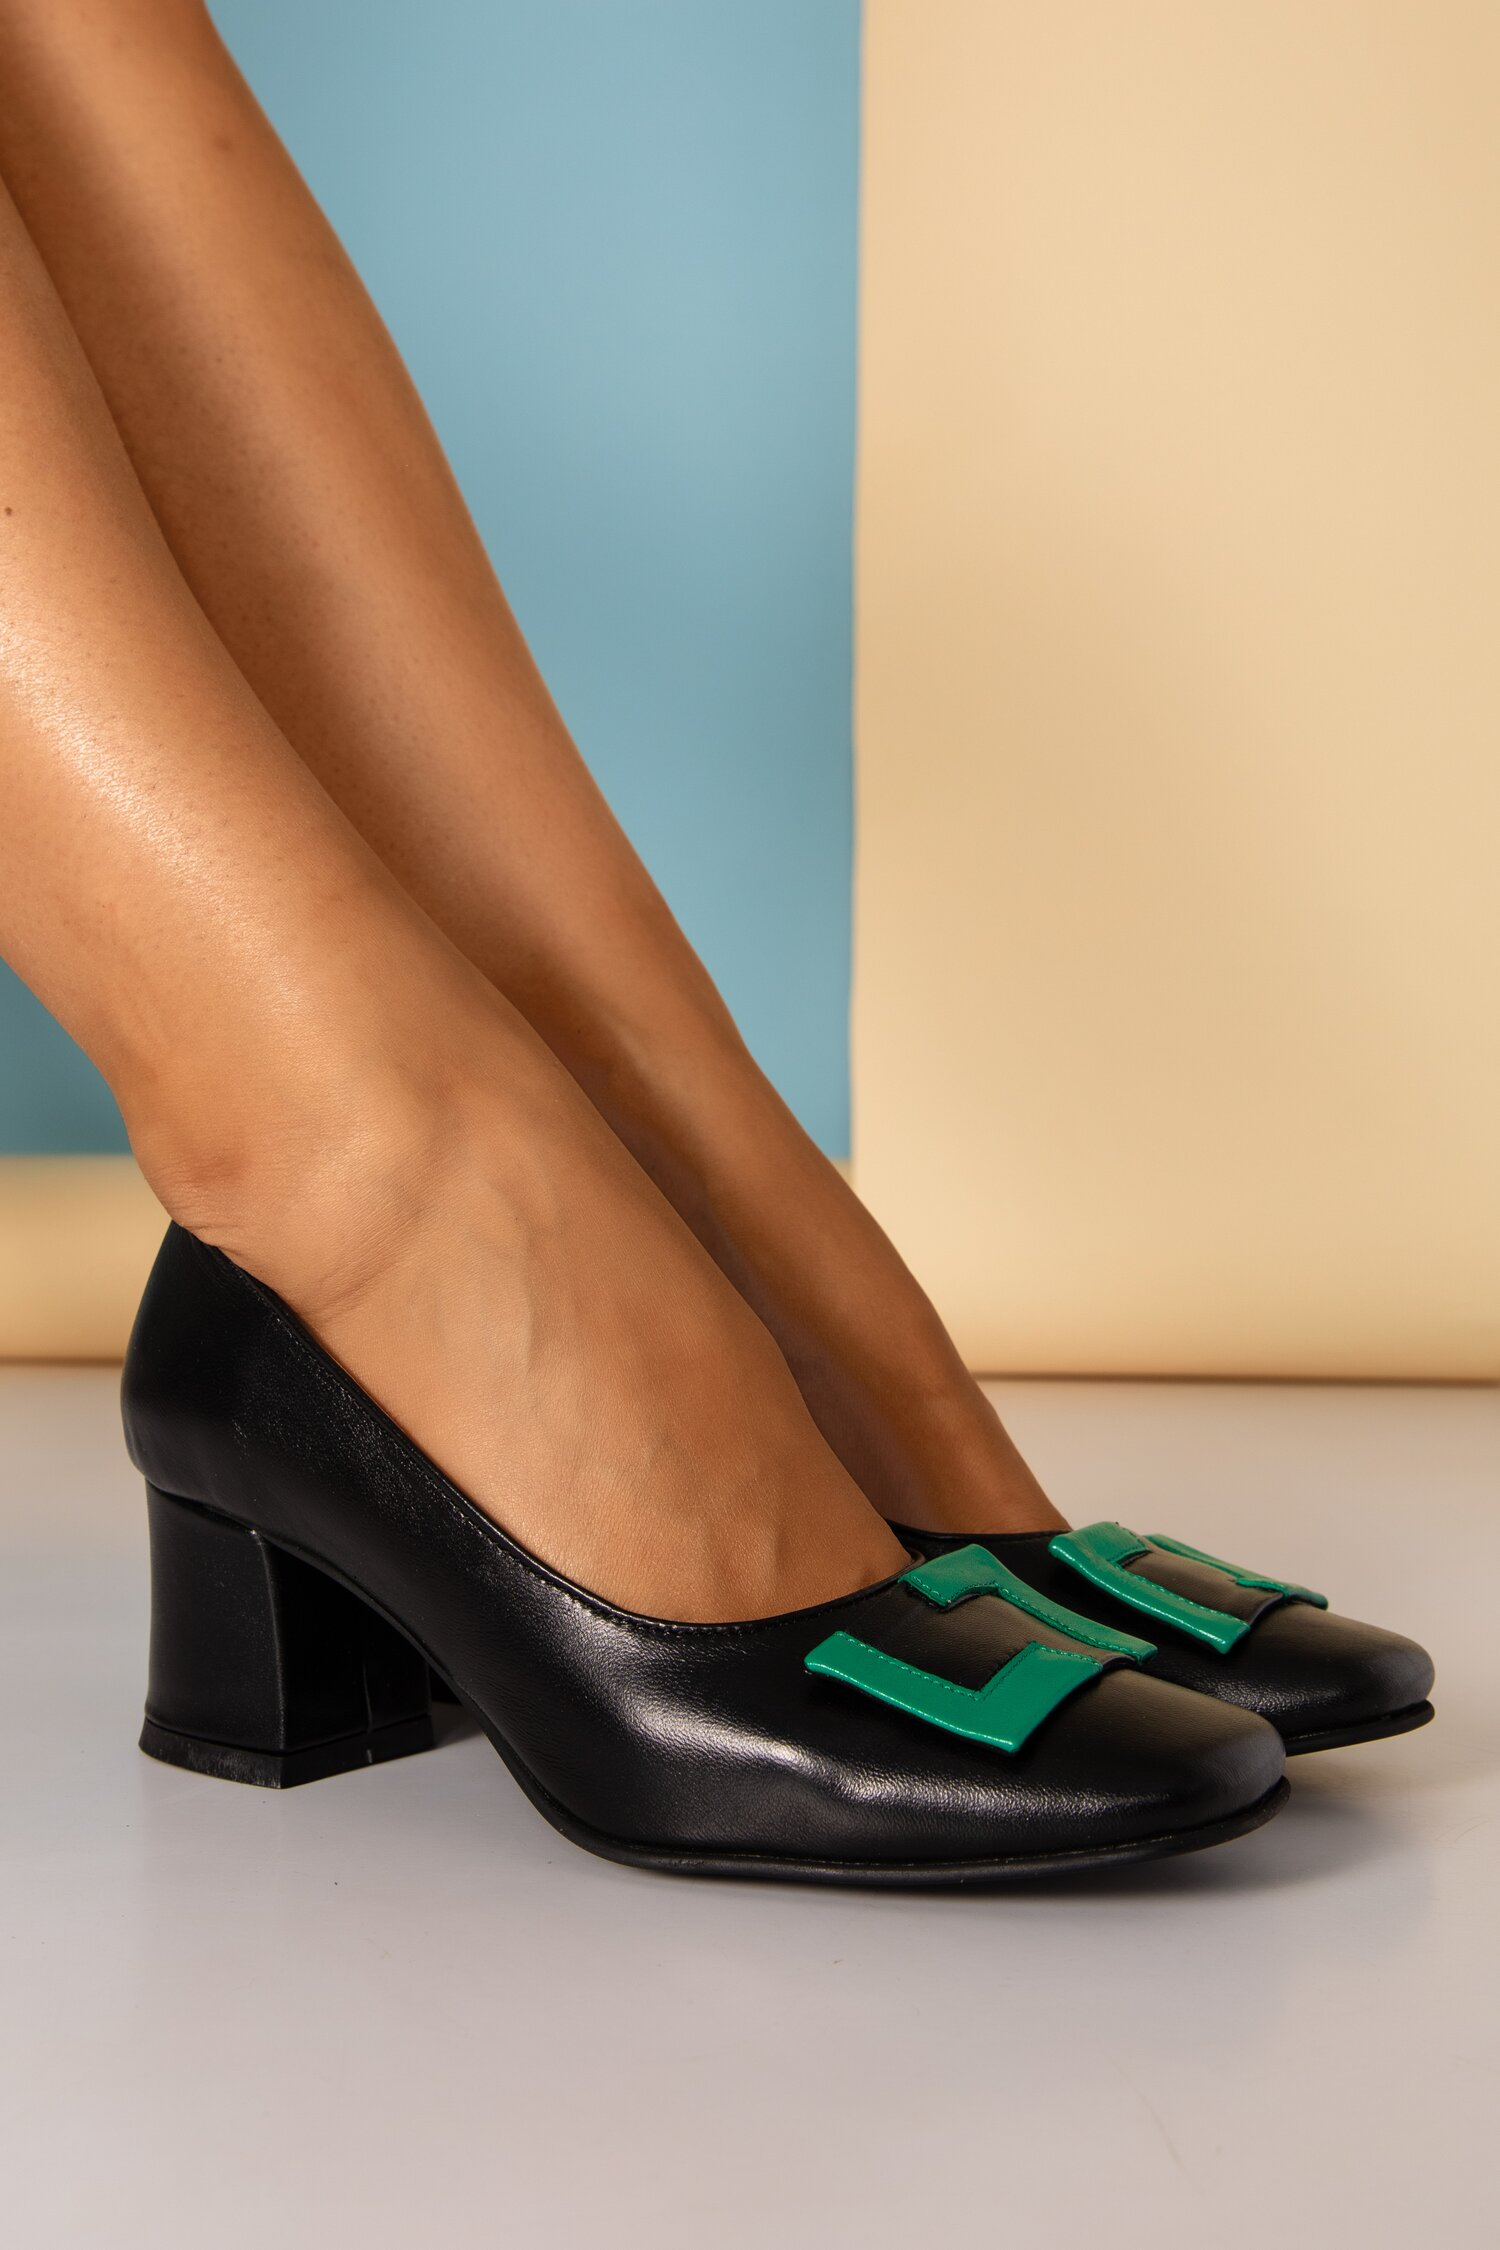 Pantofi Tanya negri cu aplicatie verde pe varf si toc gros imagine